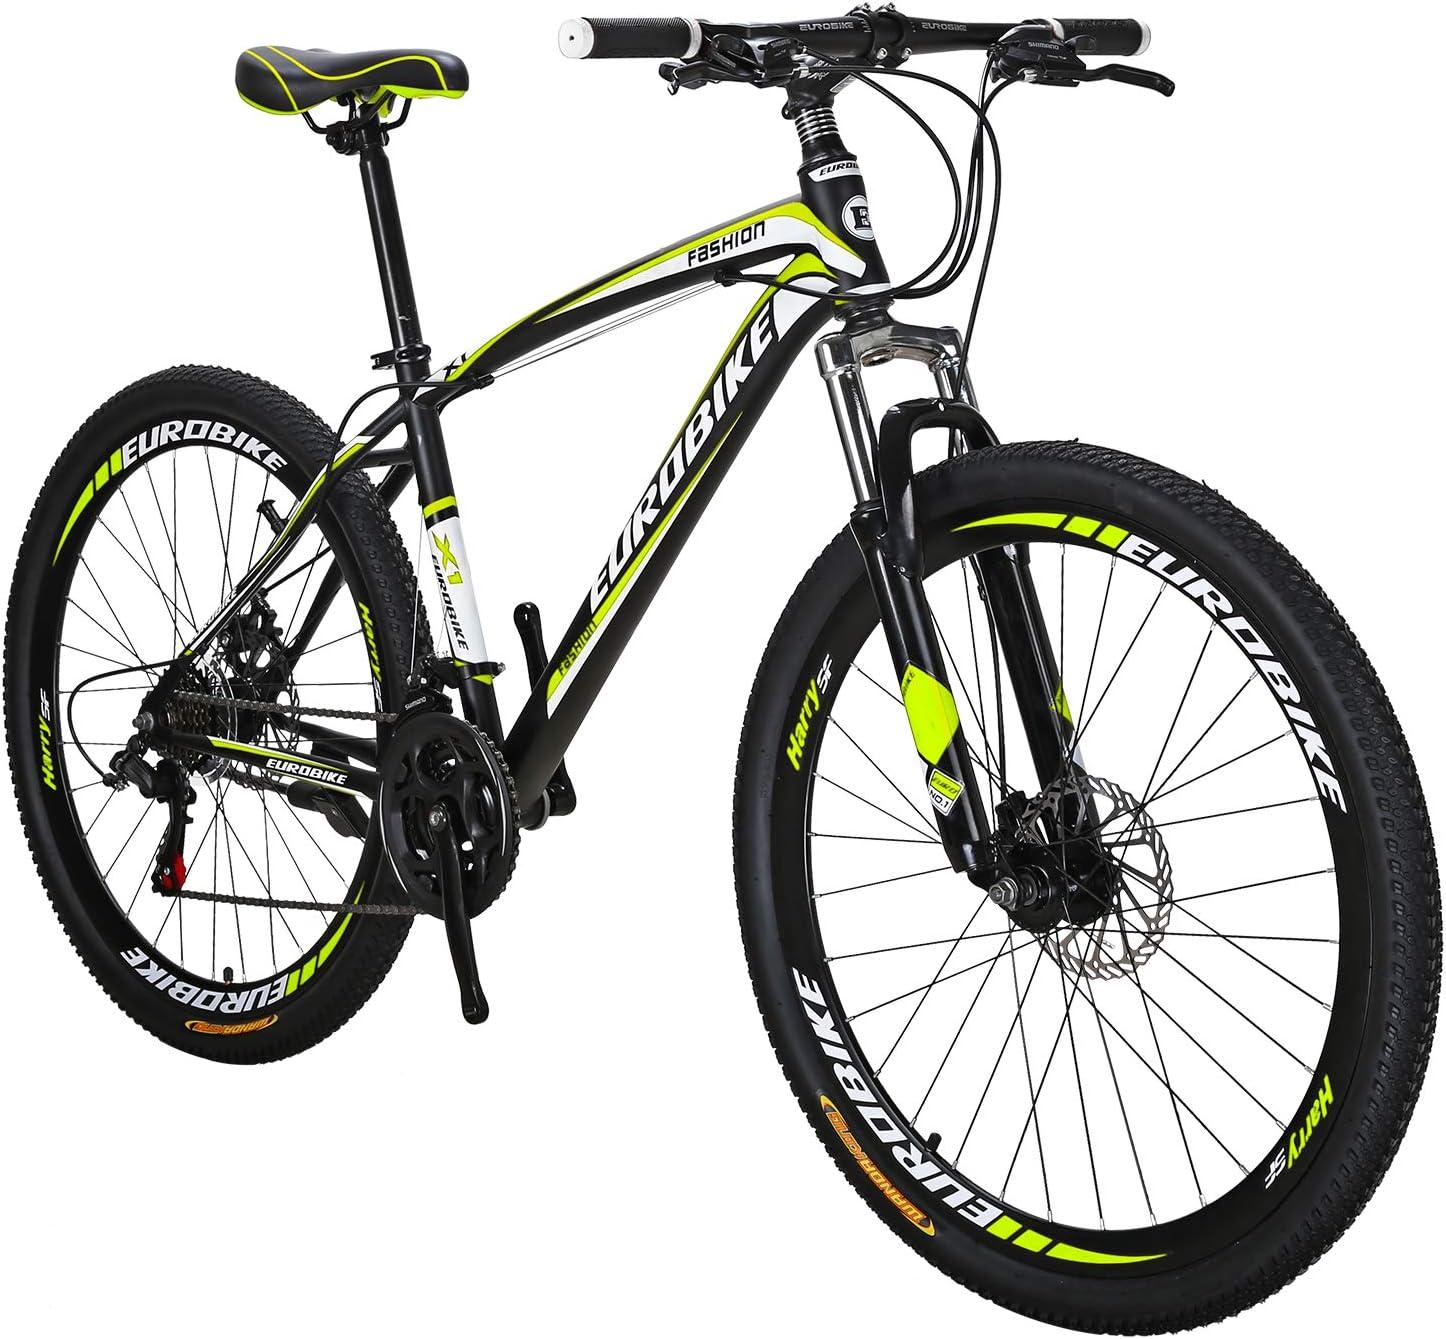 Eurobik OBK 27.5 Wheels Mountain Bike Daul Disc Brakes 21 Speed Mens Bicycle Front Suspension MTB